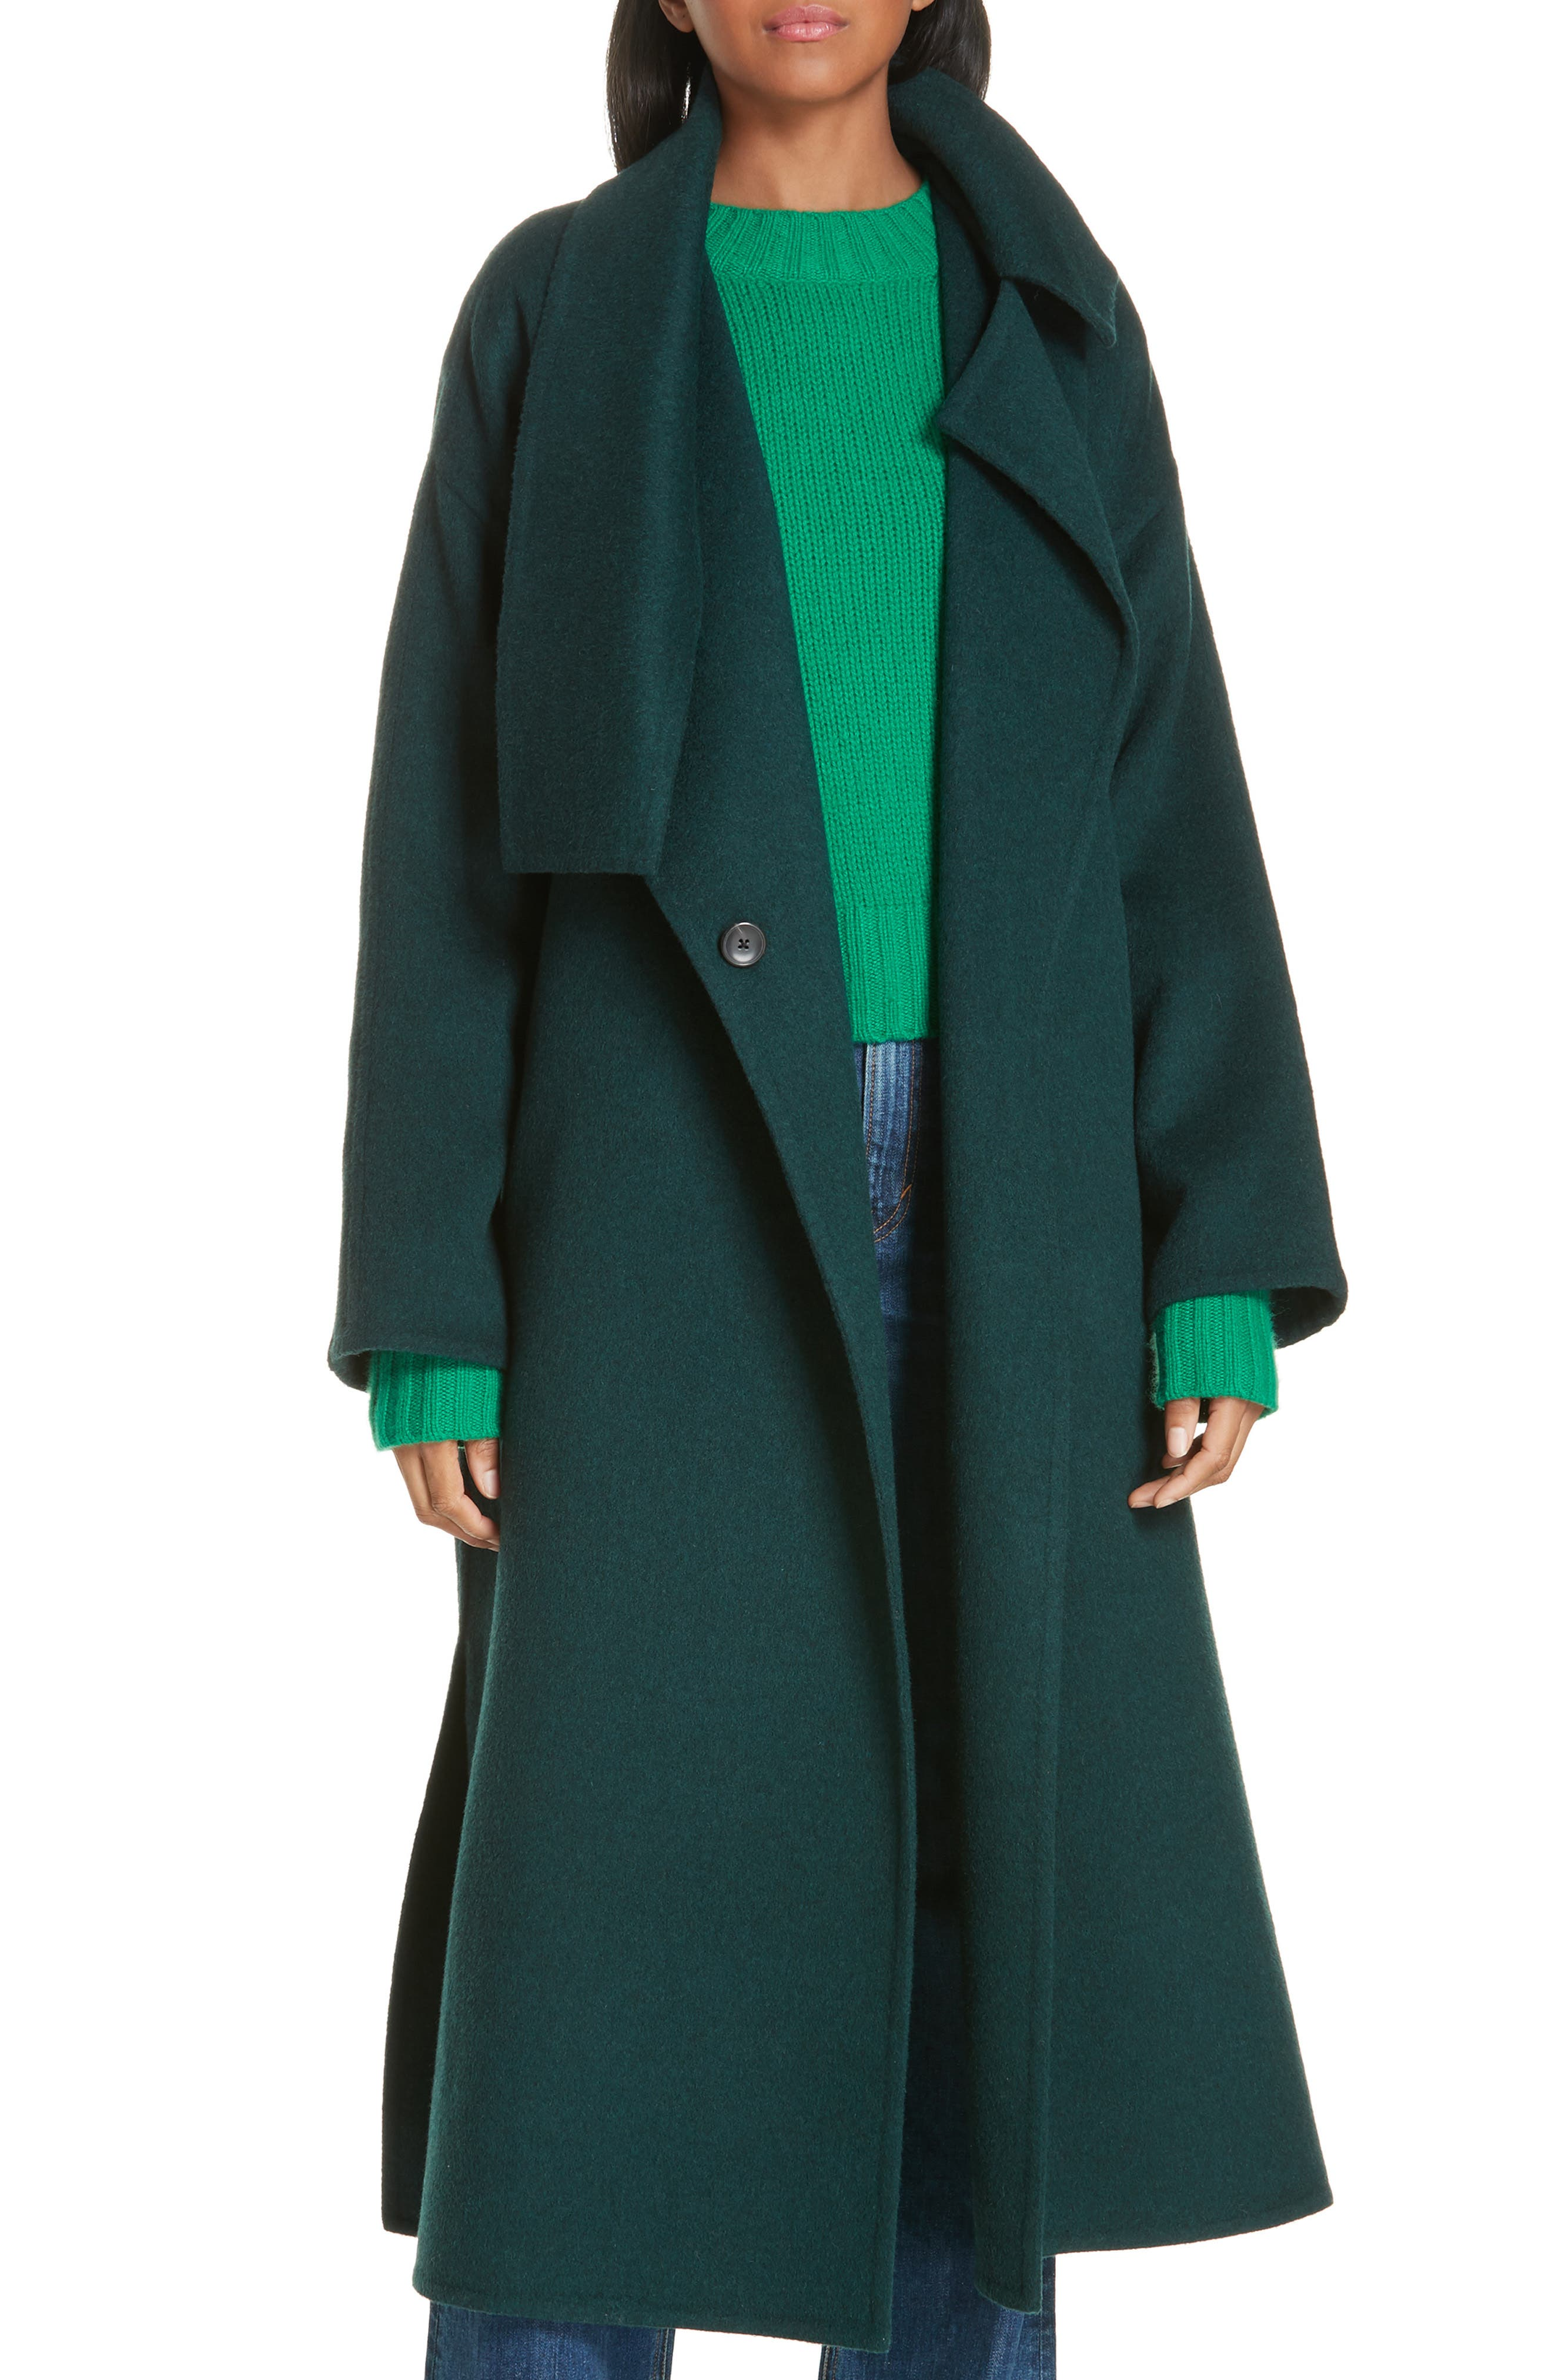 VINCE Belted Wool Blend Cozy Coat, Main, color, DARK PALM